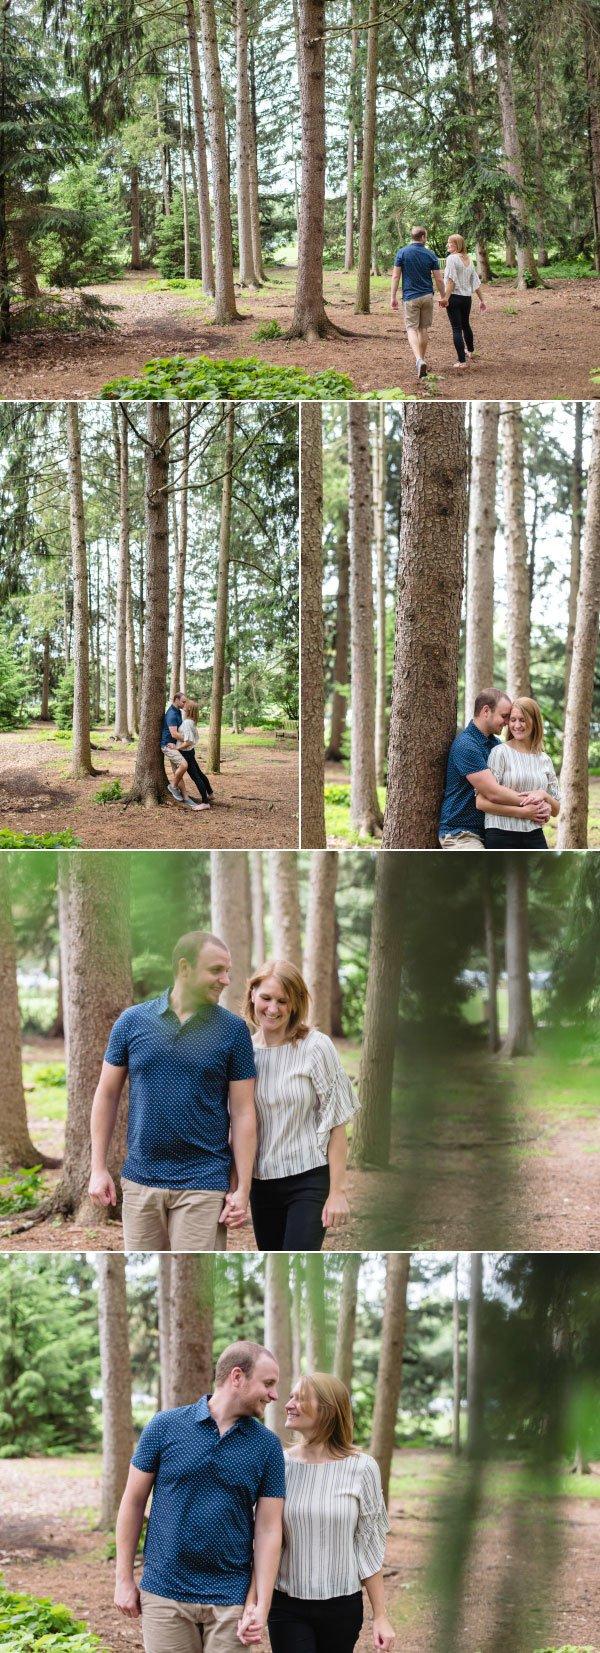 an engaged couple walking through inniswood gardens